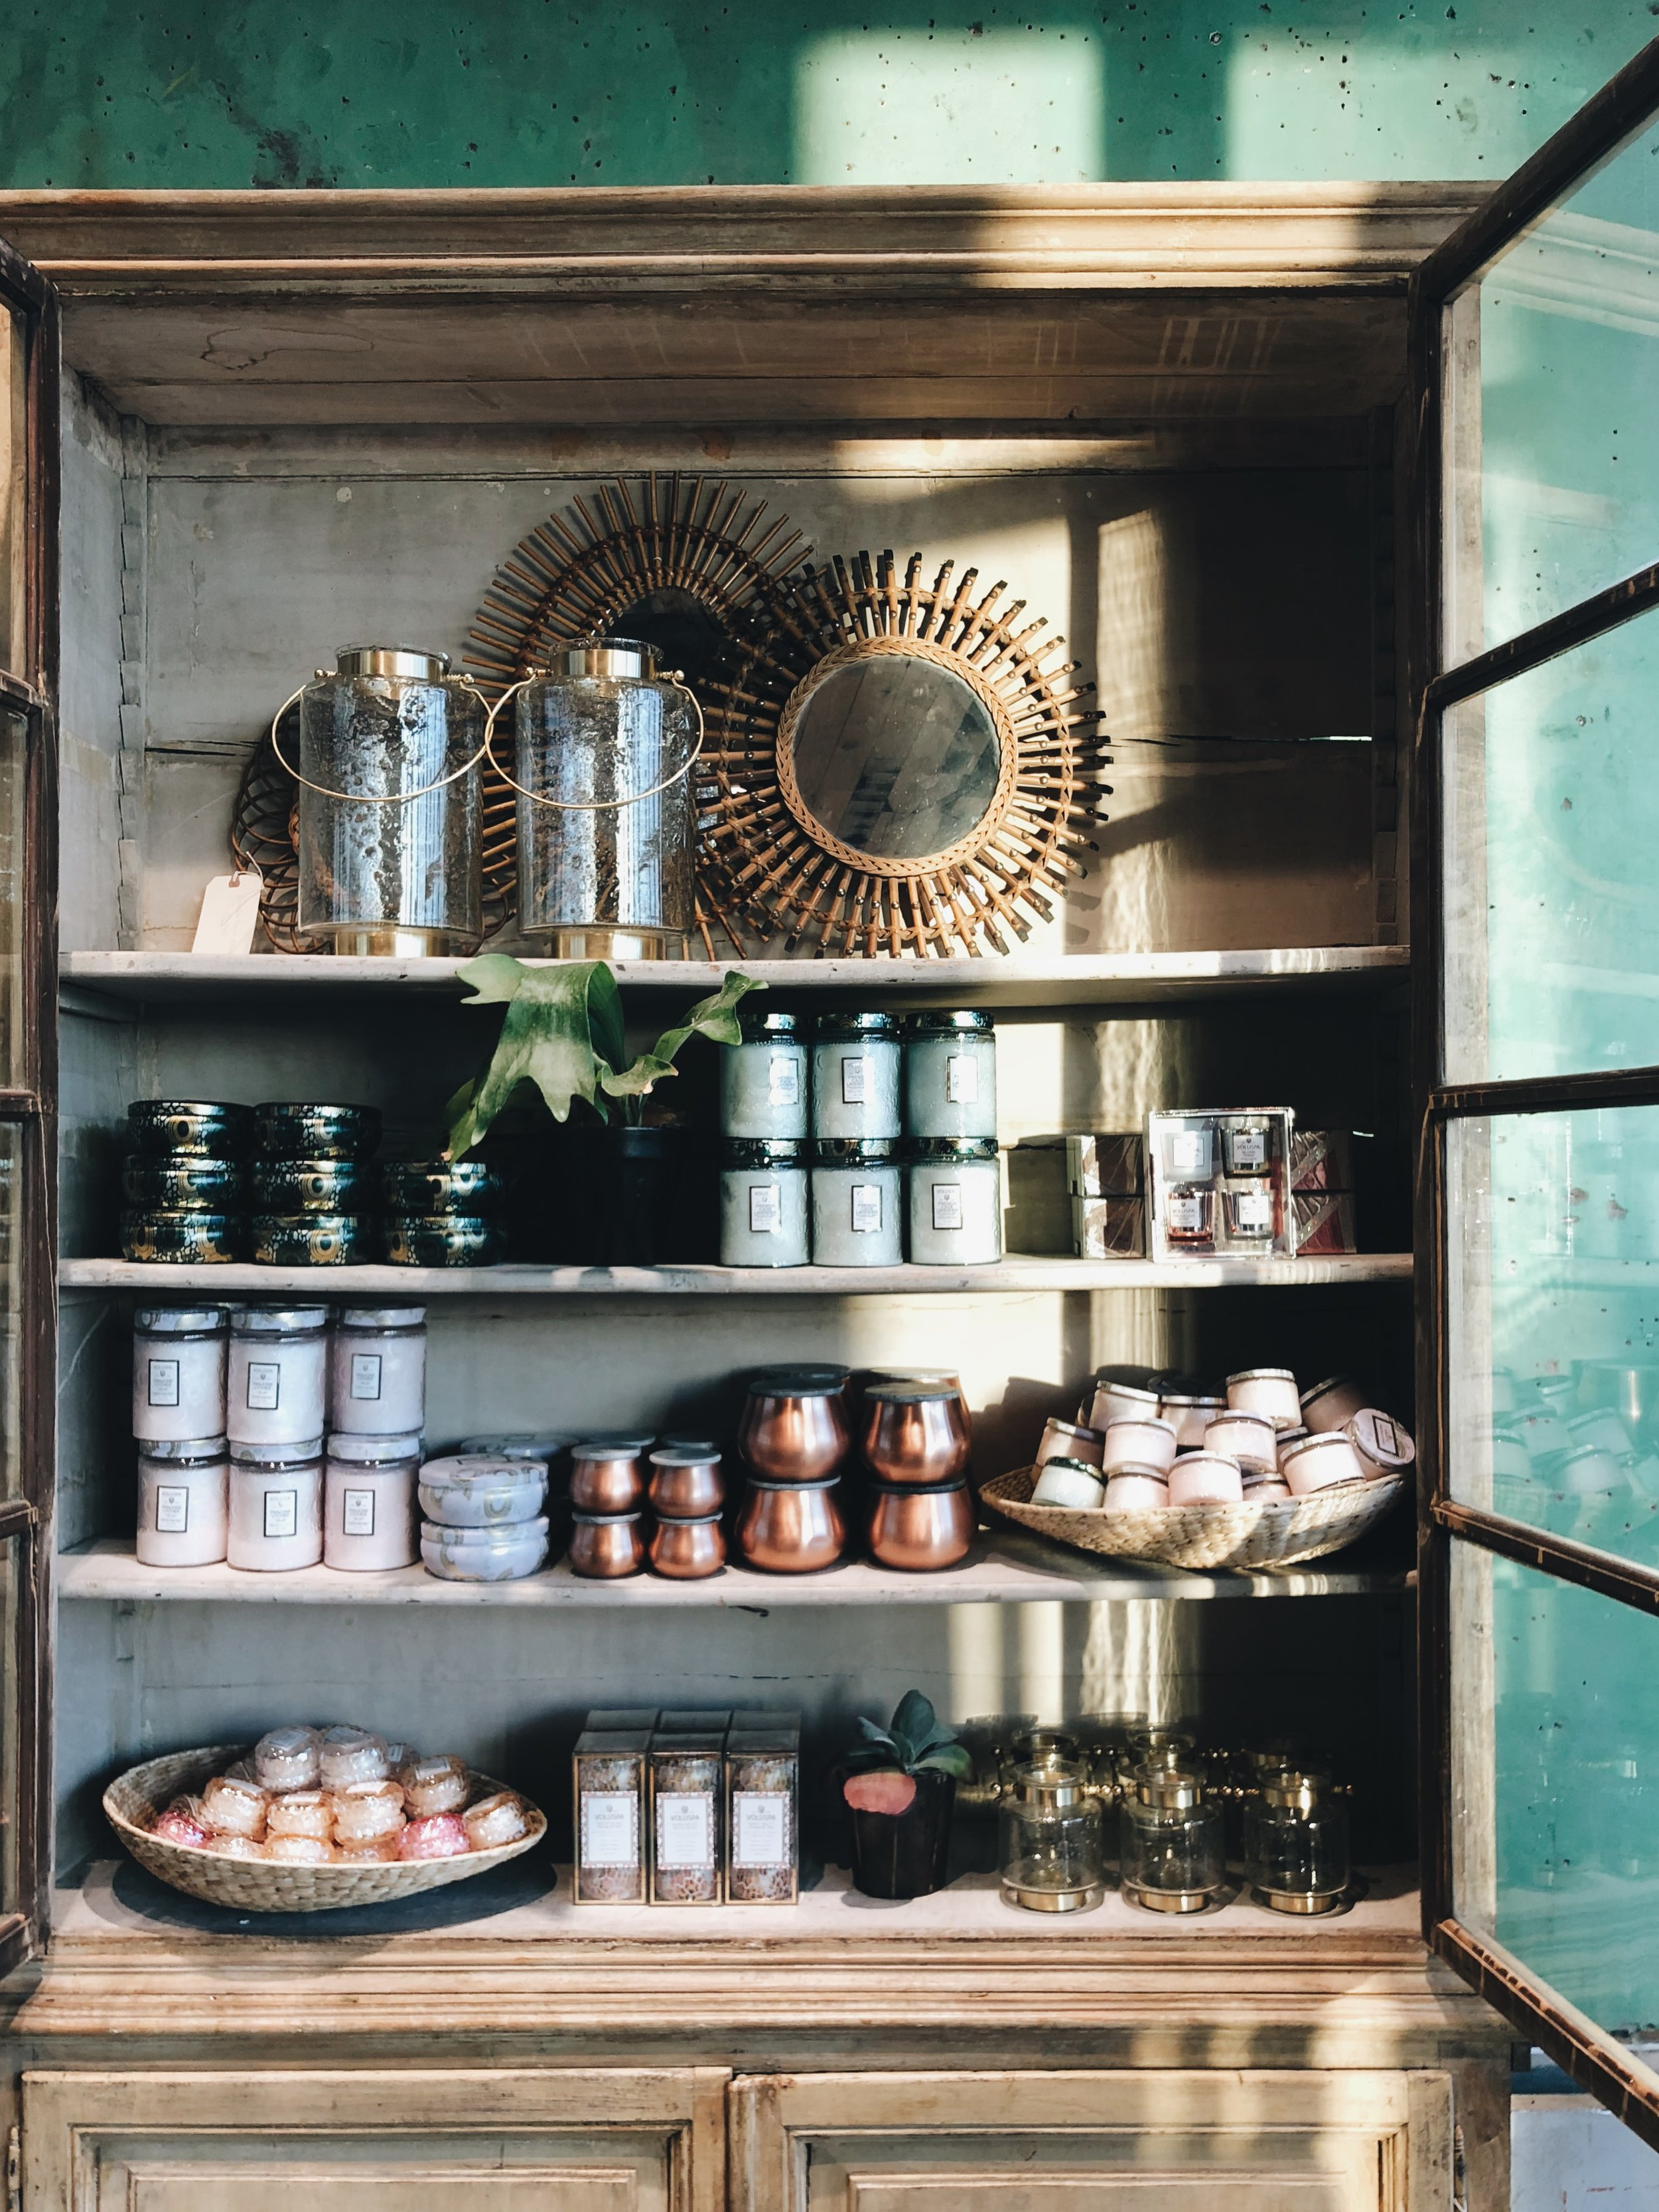 2018 Summer_Boutique Candleshop_1.JPG